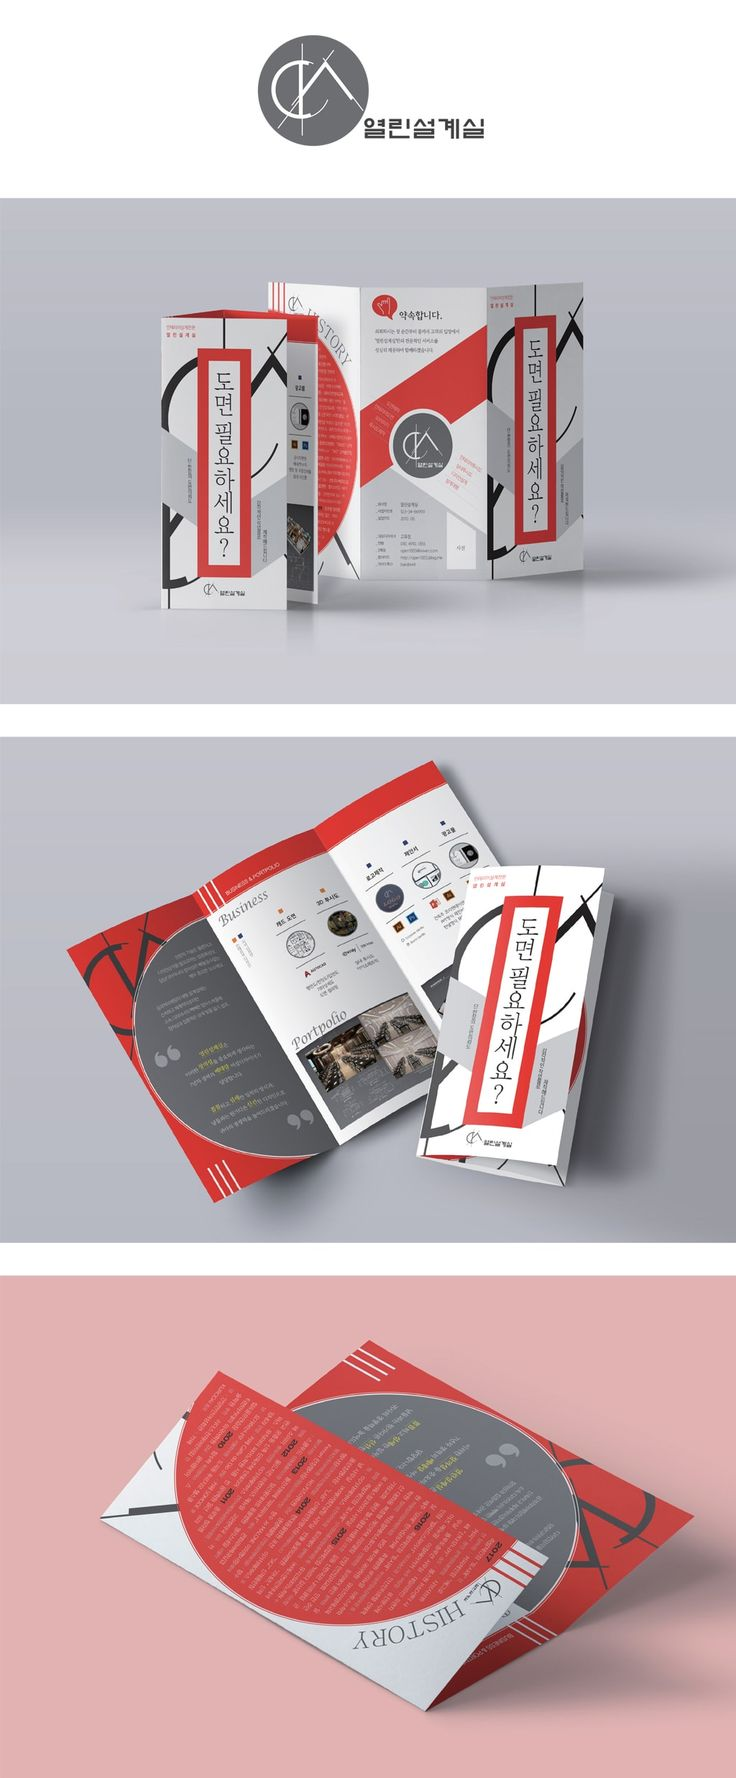 Design by bkdesign16/ #브로셔디자인 #브로셔 #리플렛 #아이덴티티 #identity  #디자인 #디자이너 #라우드소싱 #레퍼런스 #콘테스트 #editorial #poster #design #illust #포트폴리오 #디자인의뢰 #공모전 #일러스트 #포스터 #편집 #편집디자인 #일러스트 #card #color #타이포그래피 #레이아웃 #layout #bruchure #leaflet